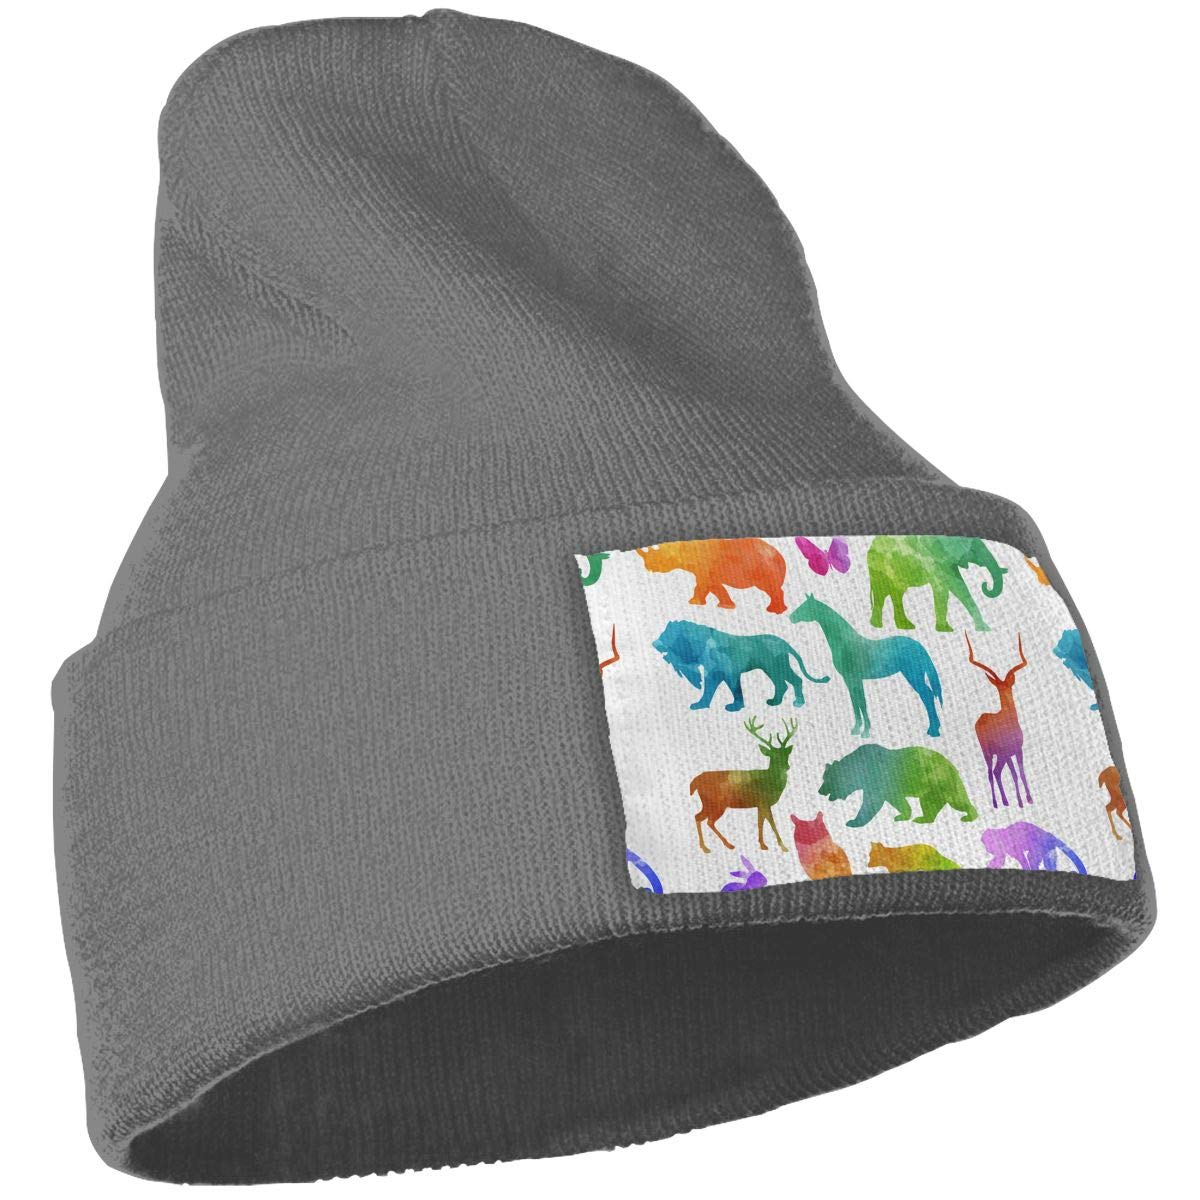 Colorful Animal Men /& Women Skull Caps Winter Warm Stretchy Knitting Beanie Hats